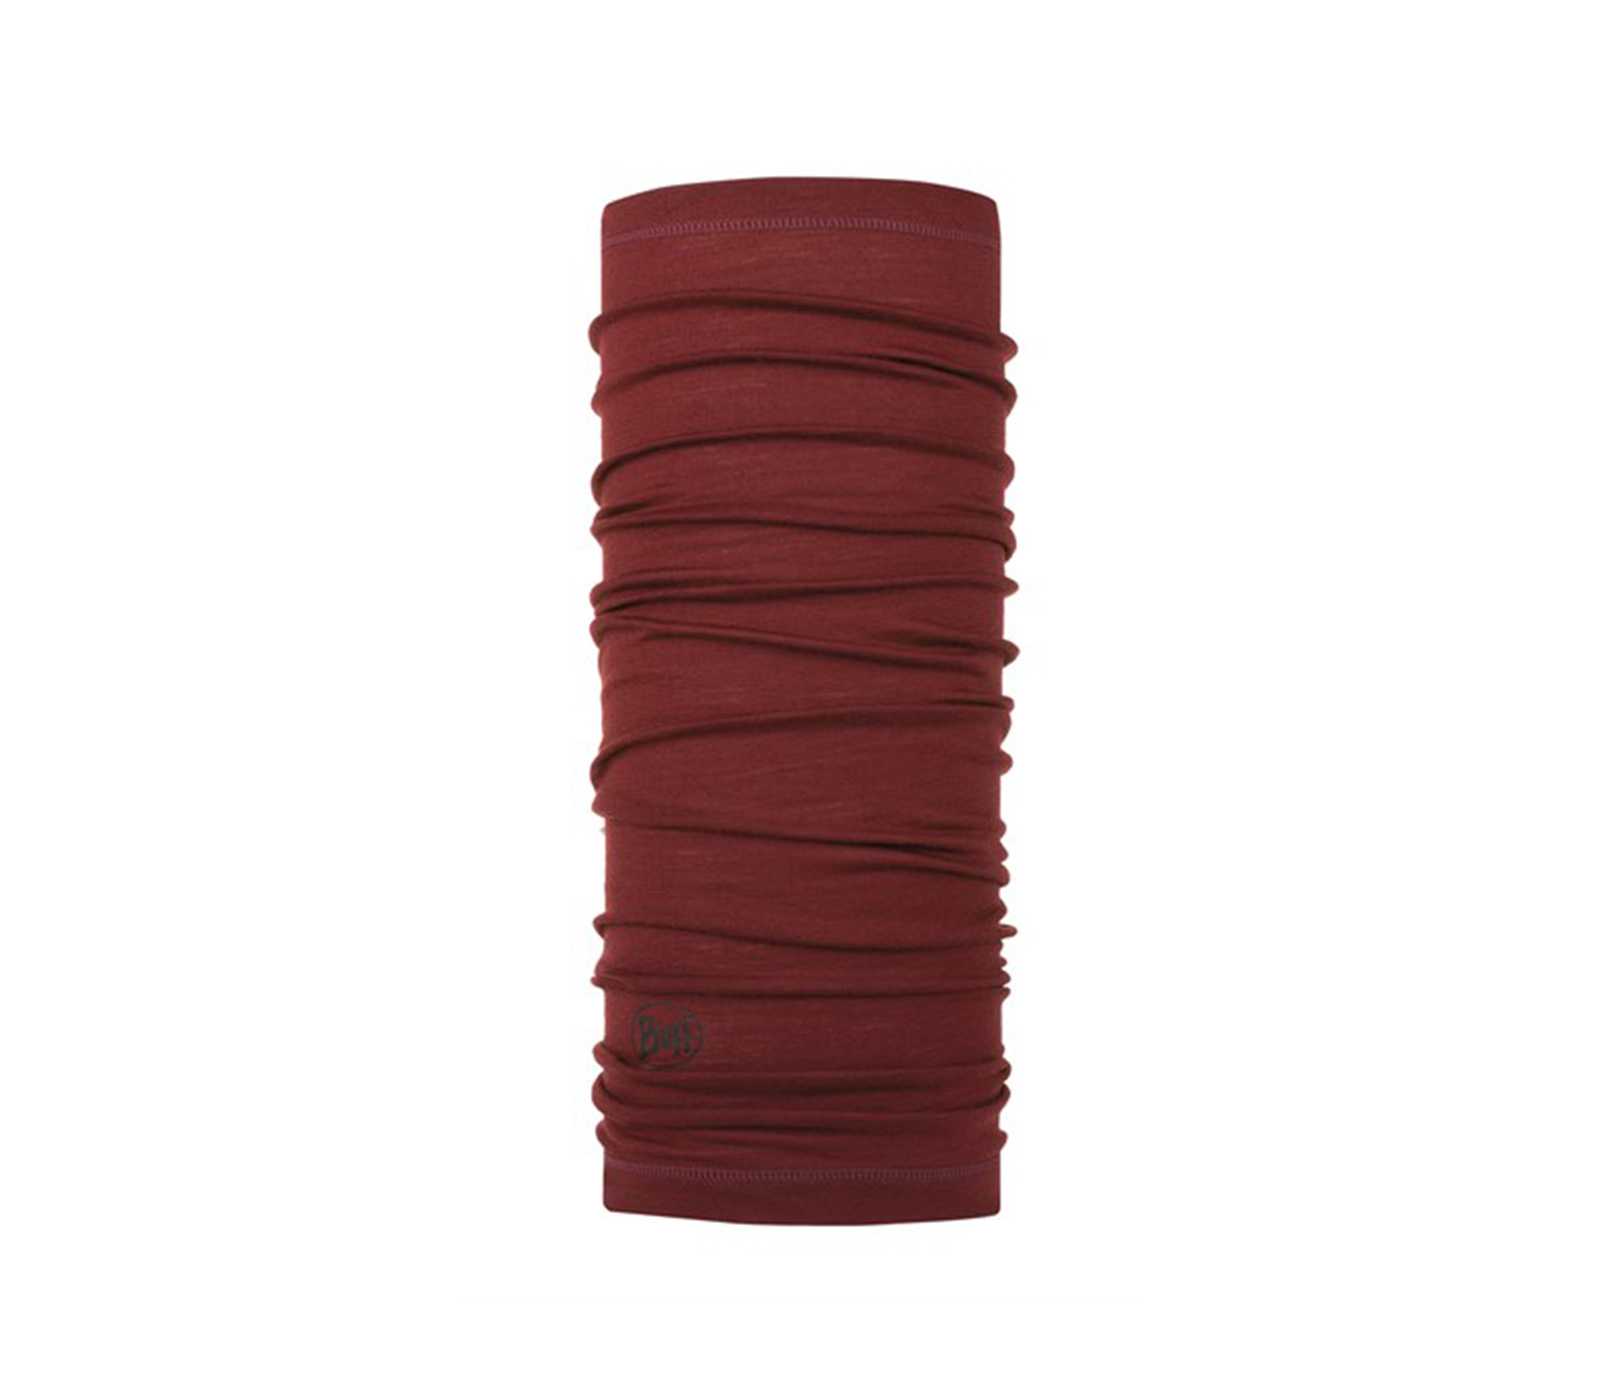 Buff Lw Merino Wool Solid Nekwarmer